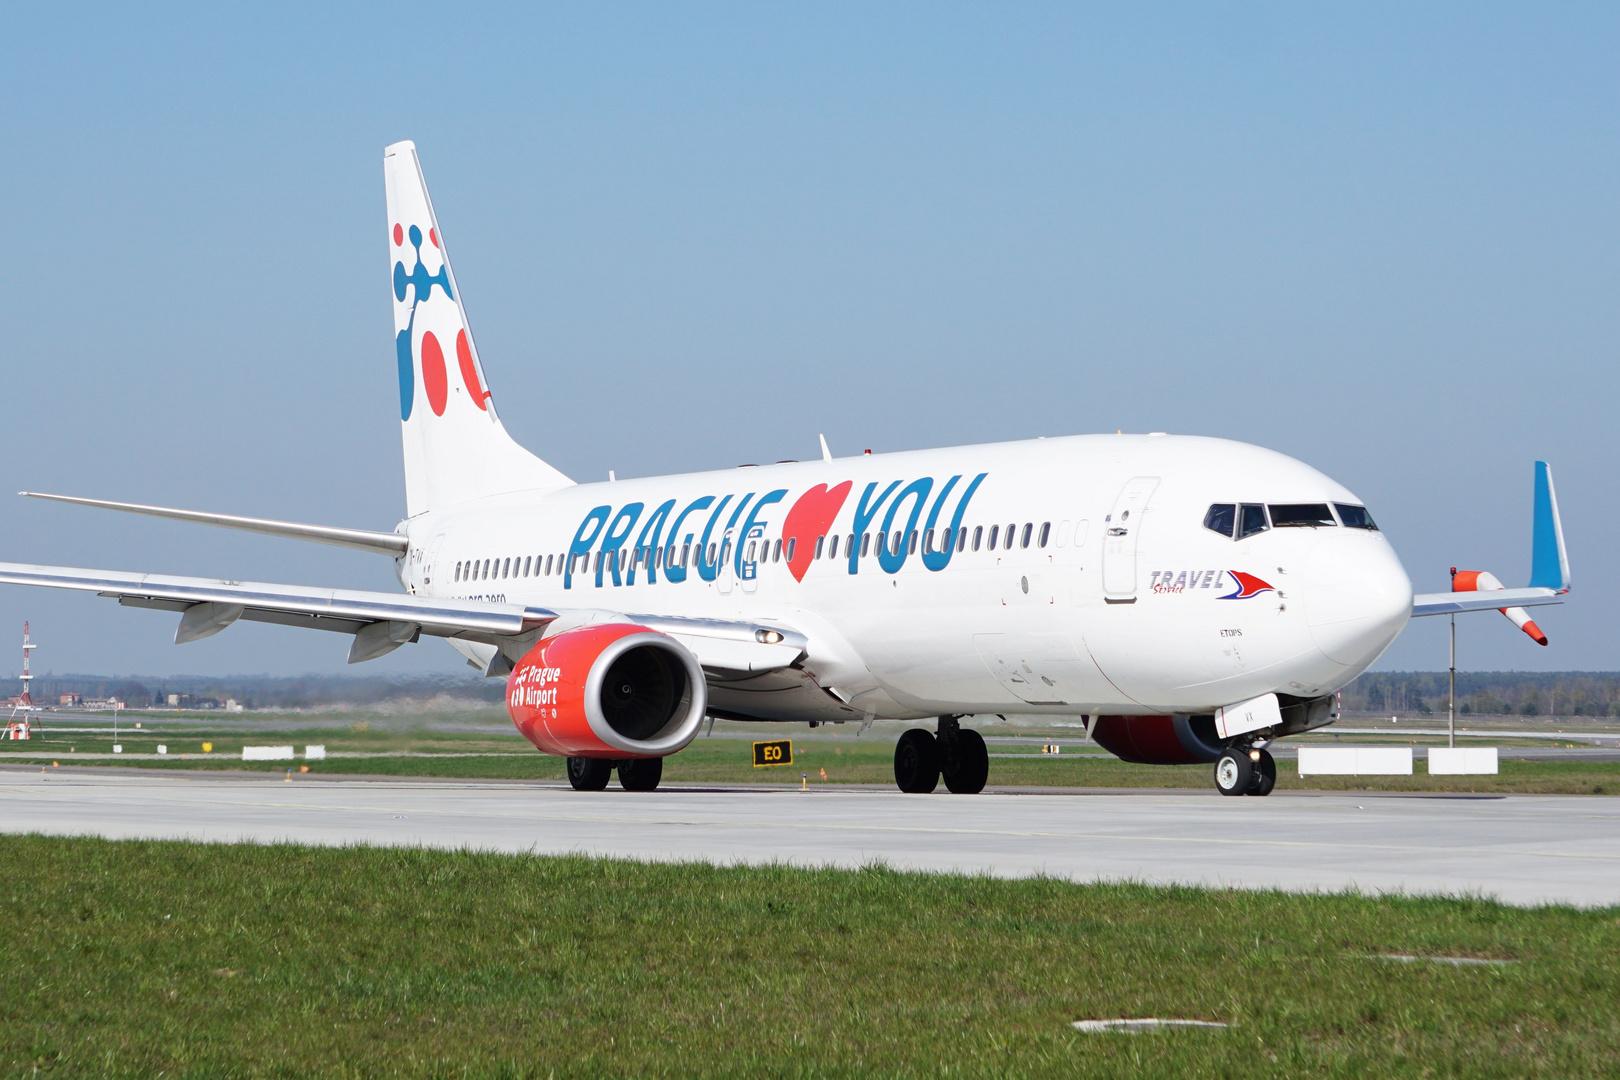 Boeing 737 - Prague Loves You